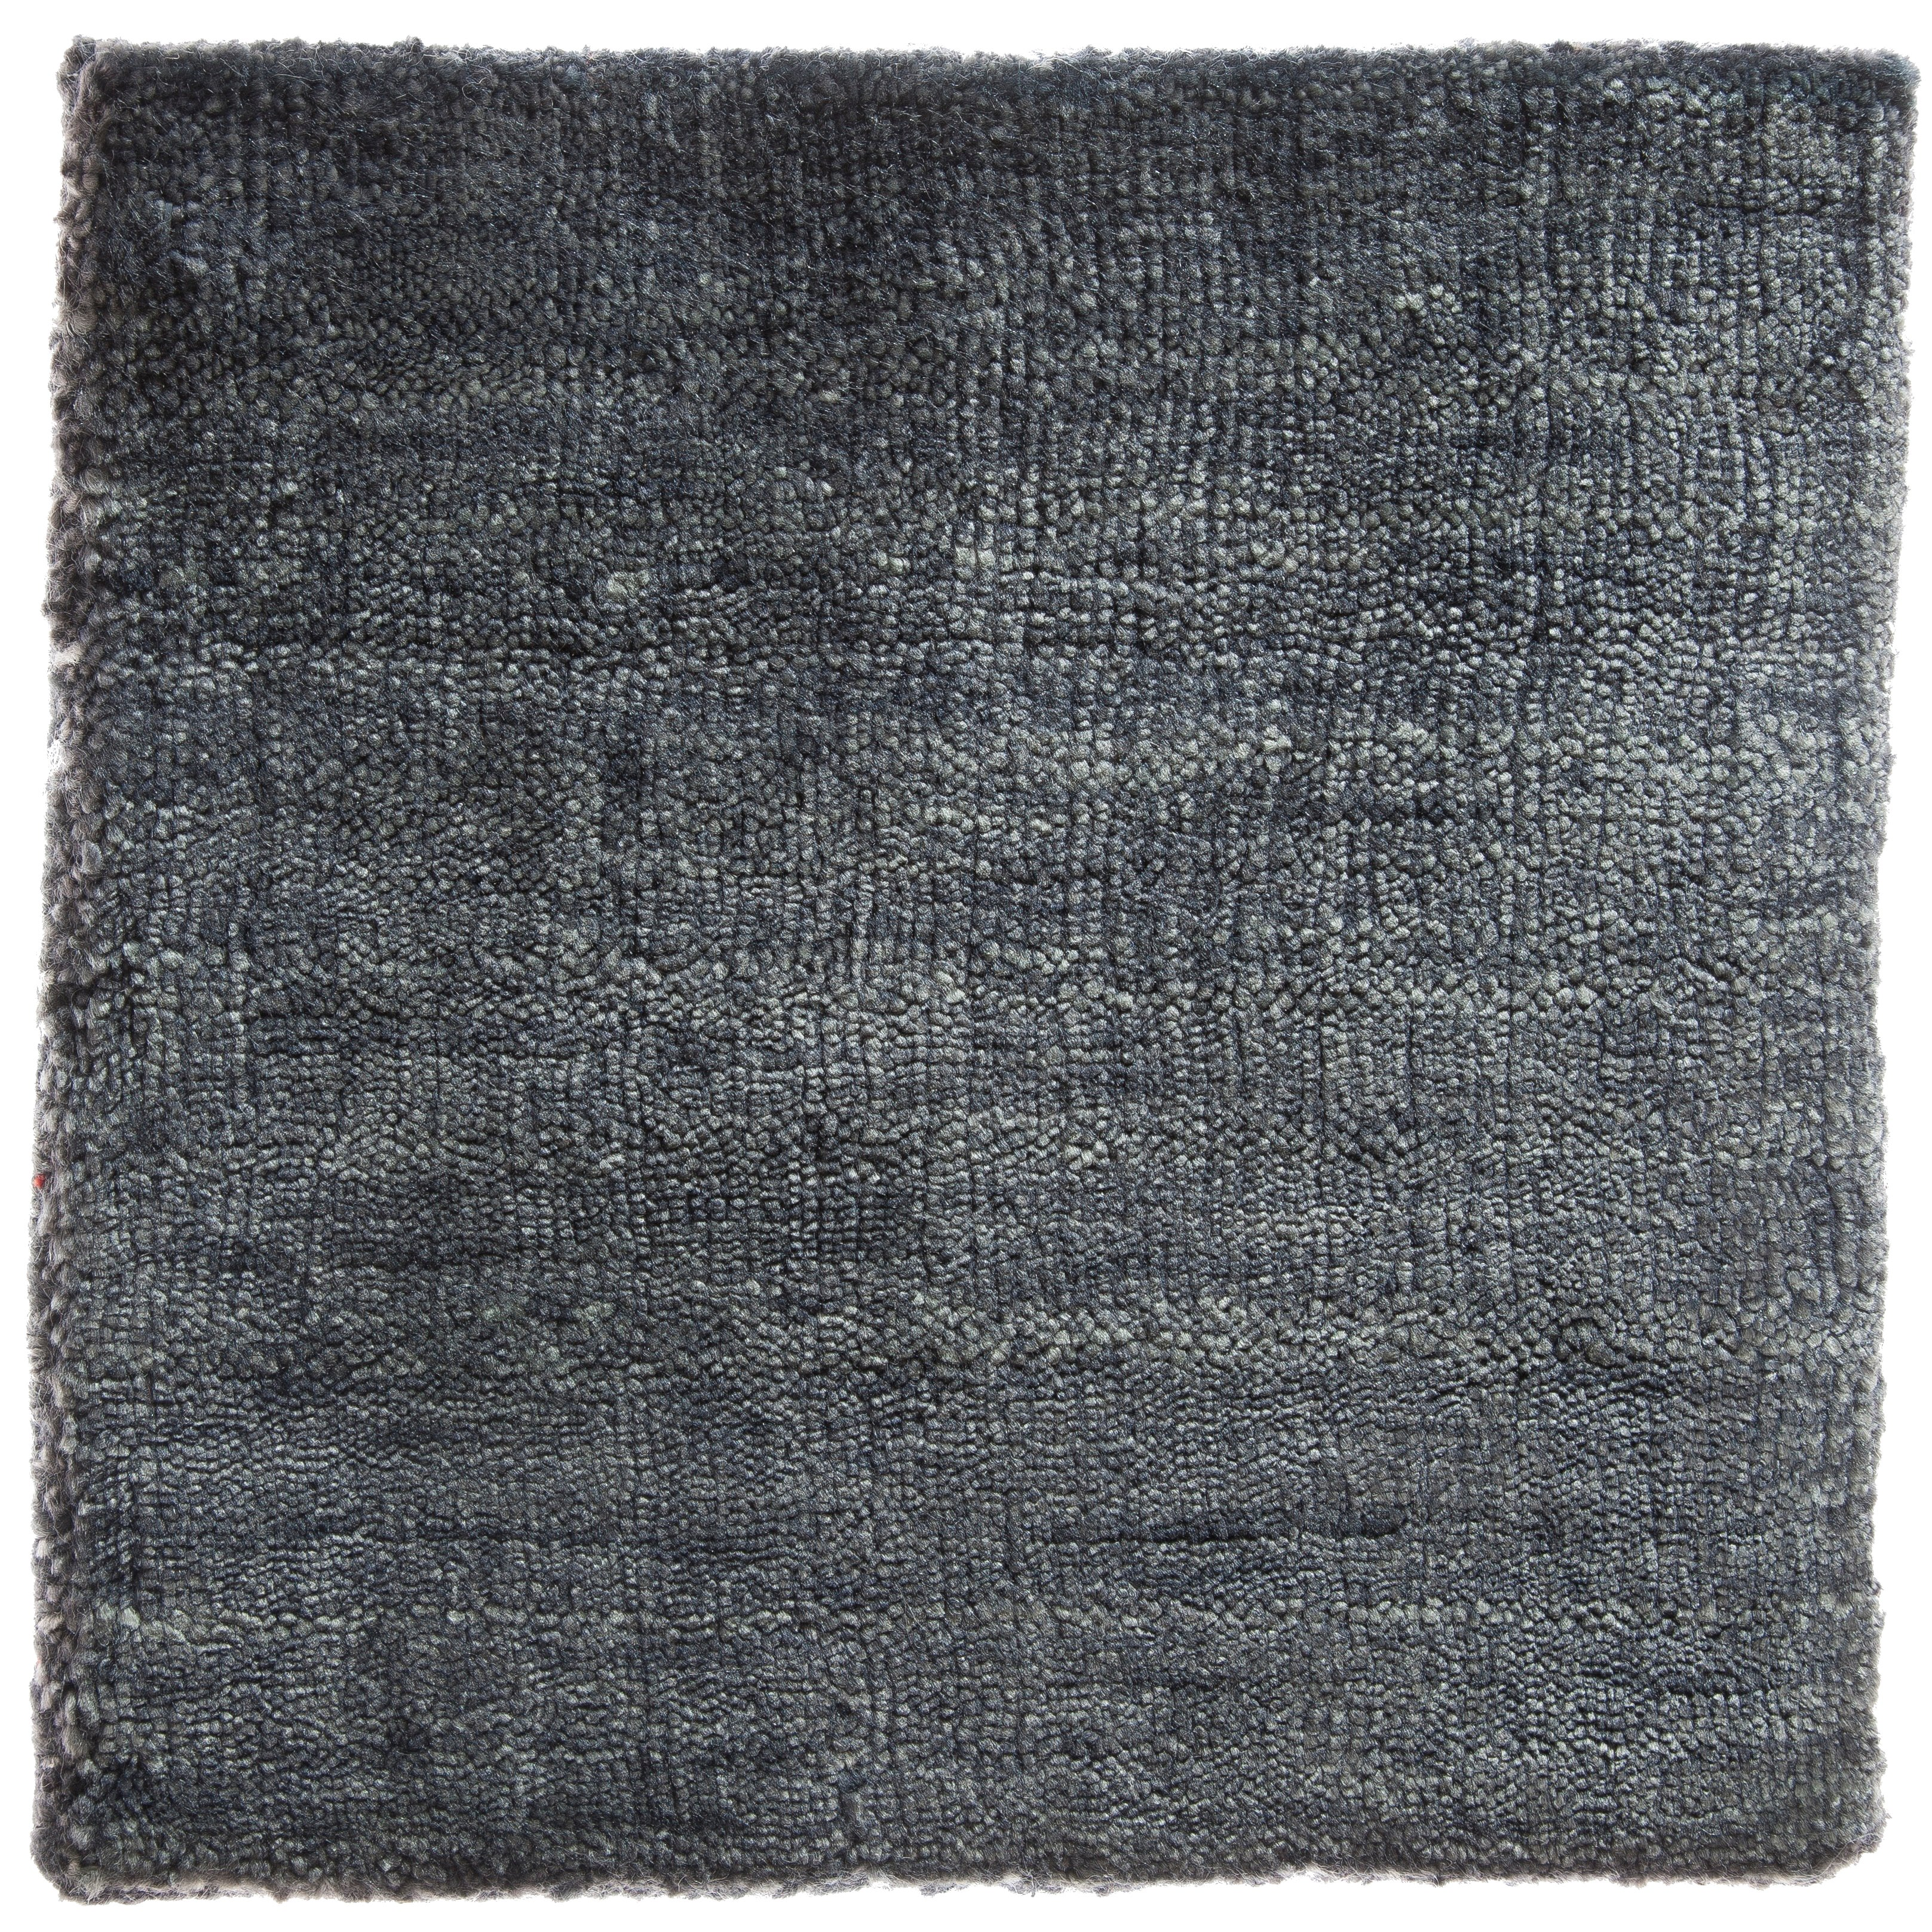 Solid Indigo Blue Hand-Loom Bamboo Silk Soft Neutral Rug in Custom Size